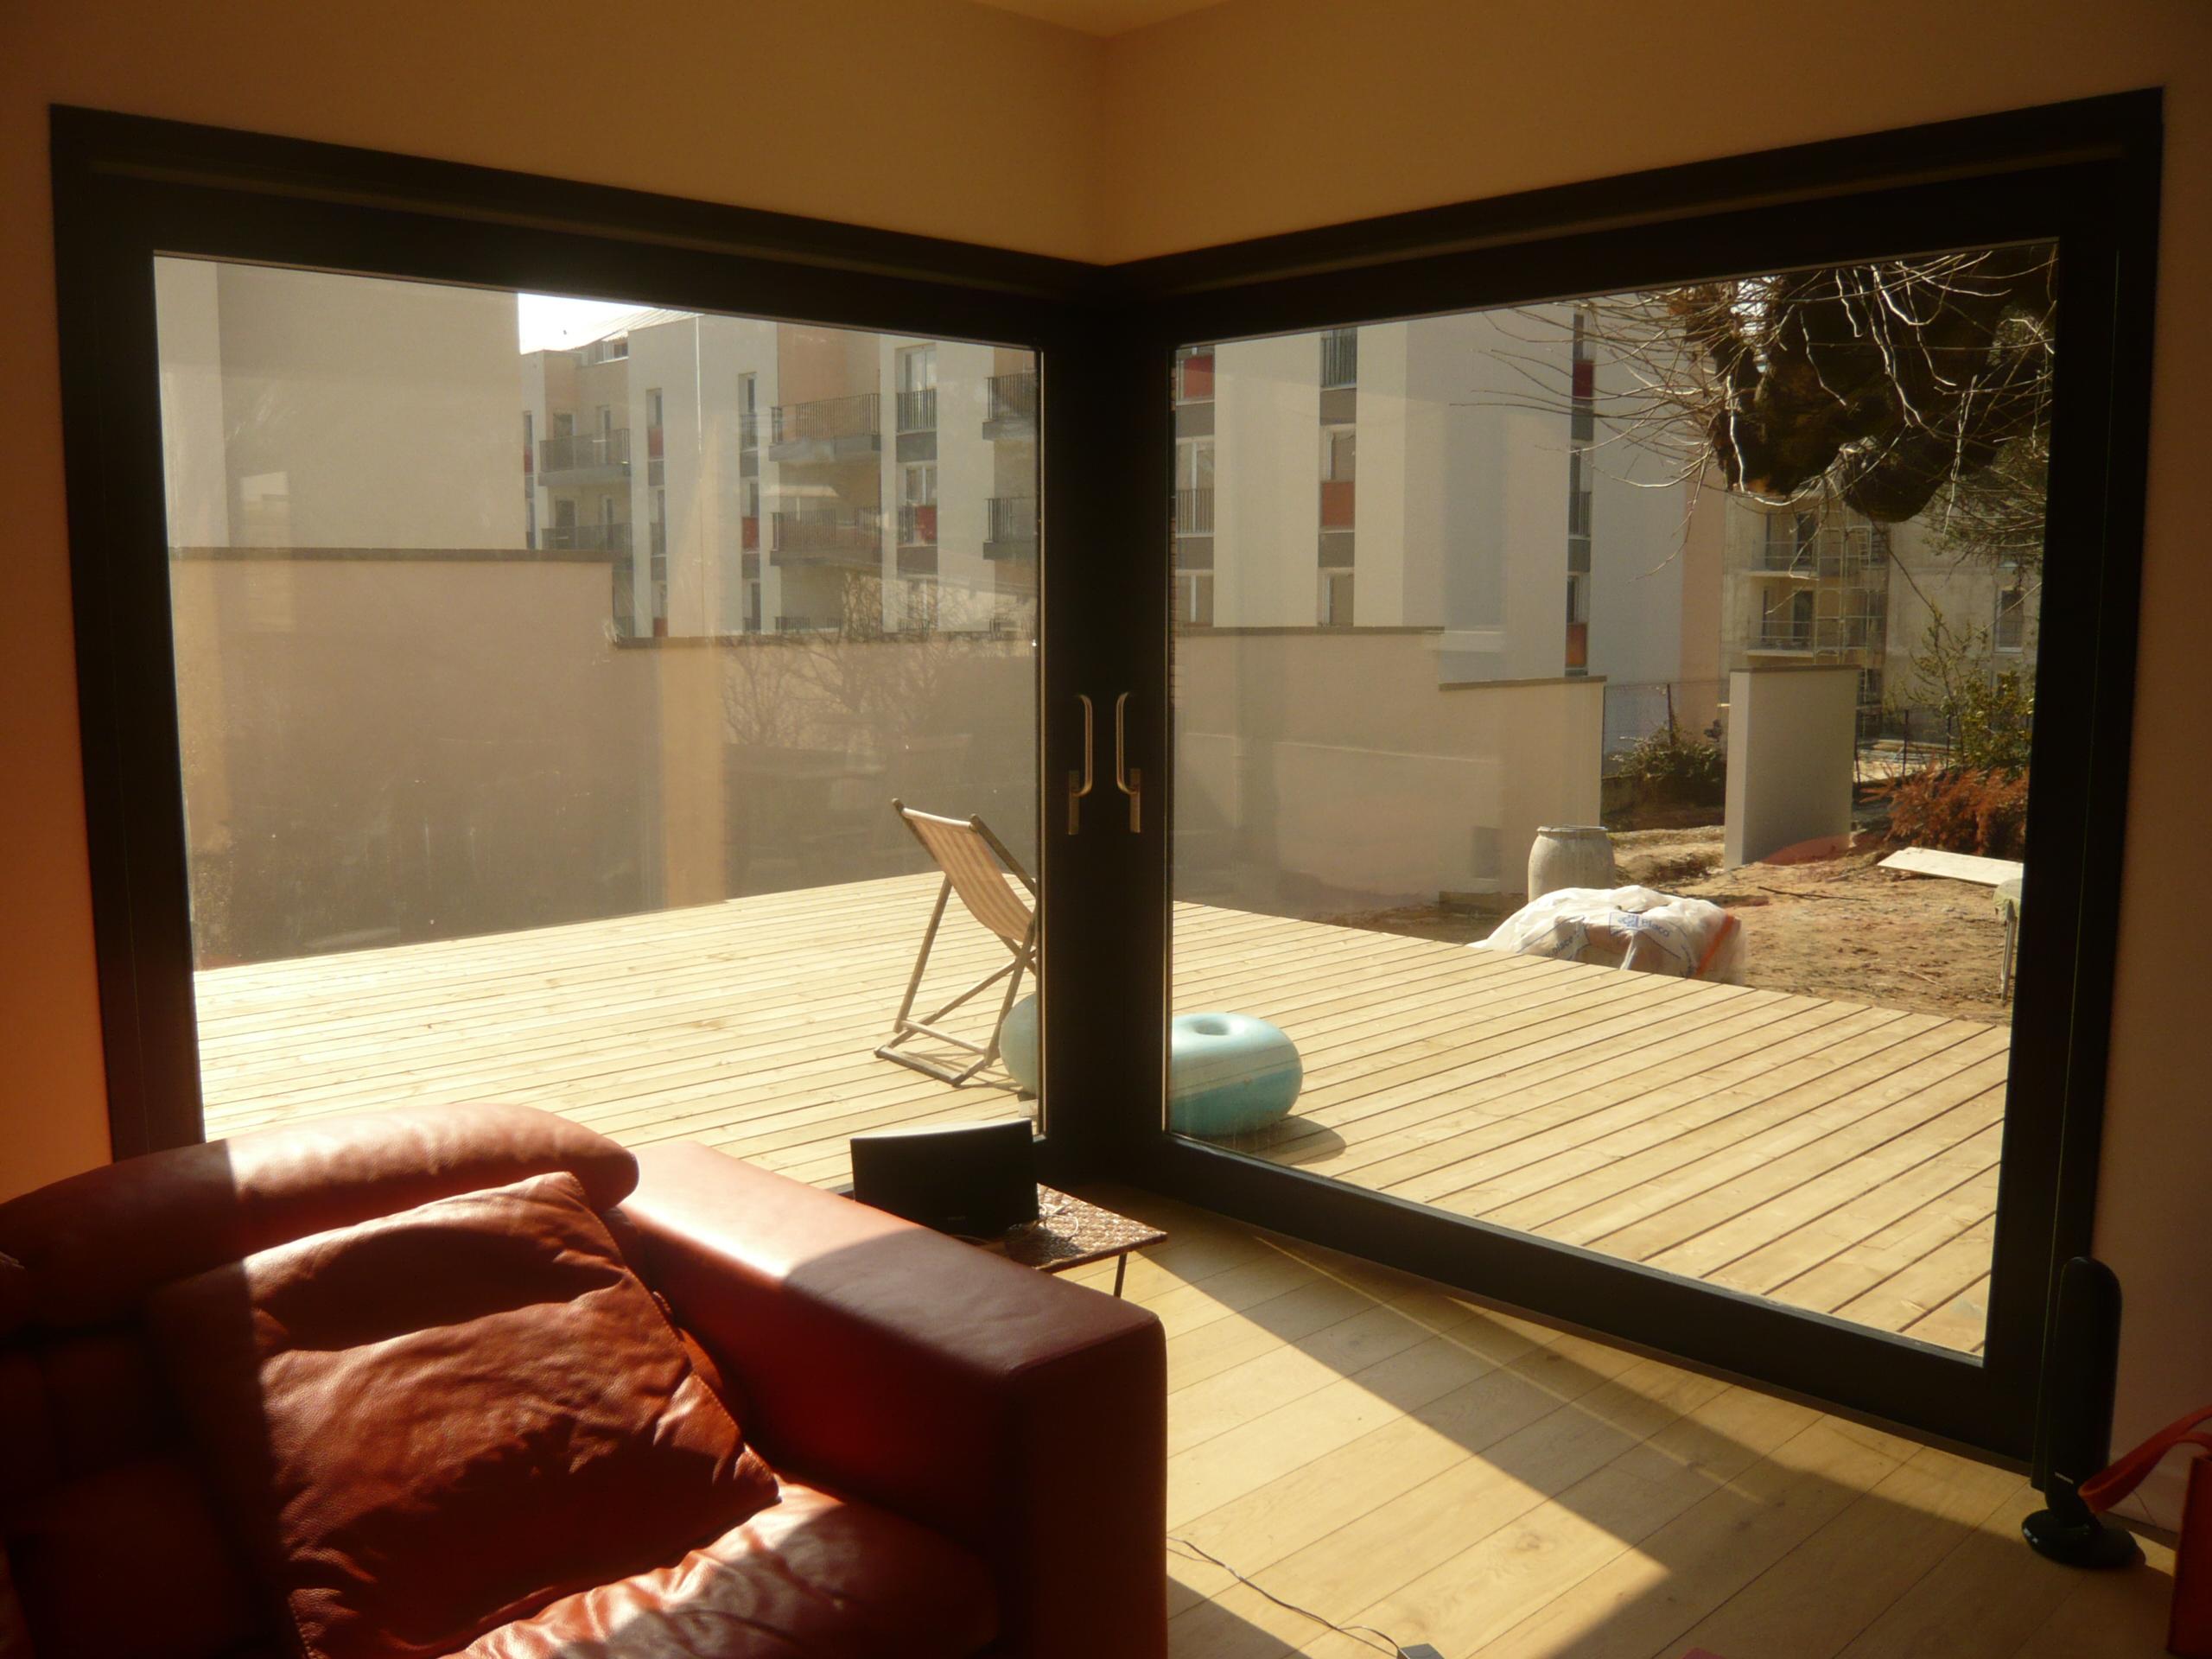 Interieur extension baie vitree